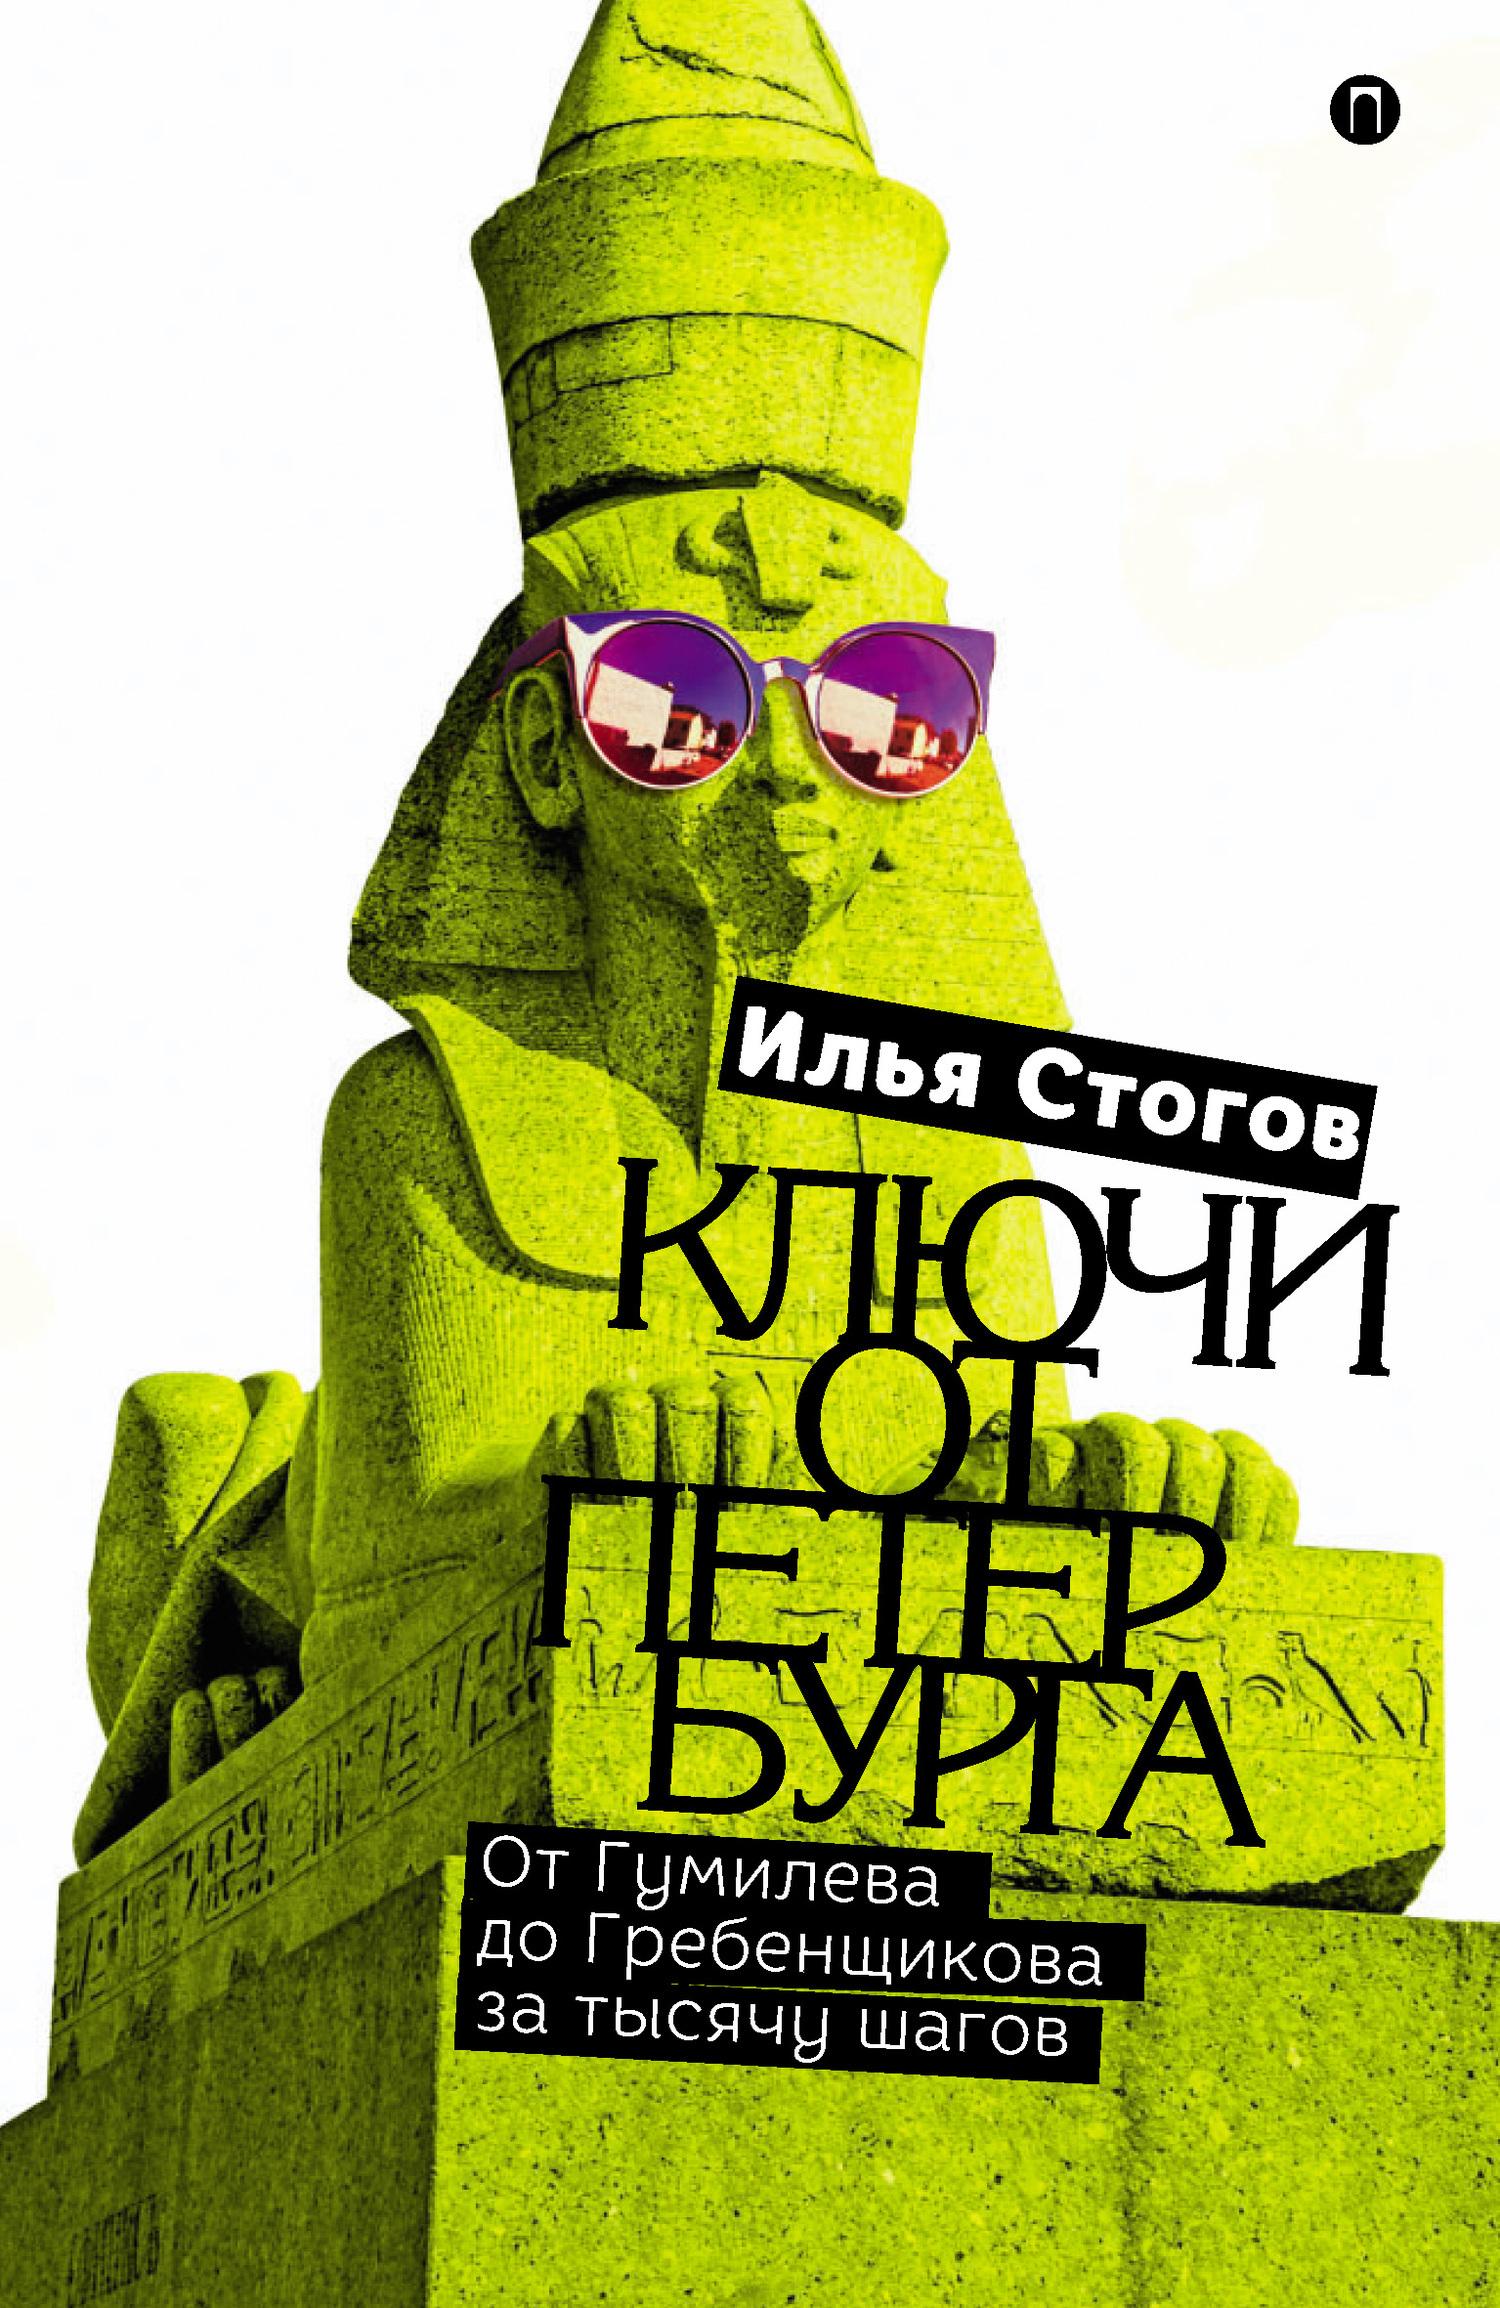 Илья Стогов - Ключи от Петербурга. От Гумилева до Гребенщикова за тысячу шагов